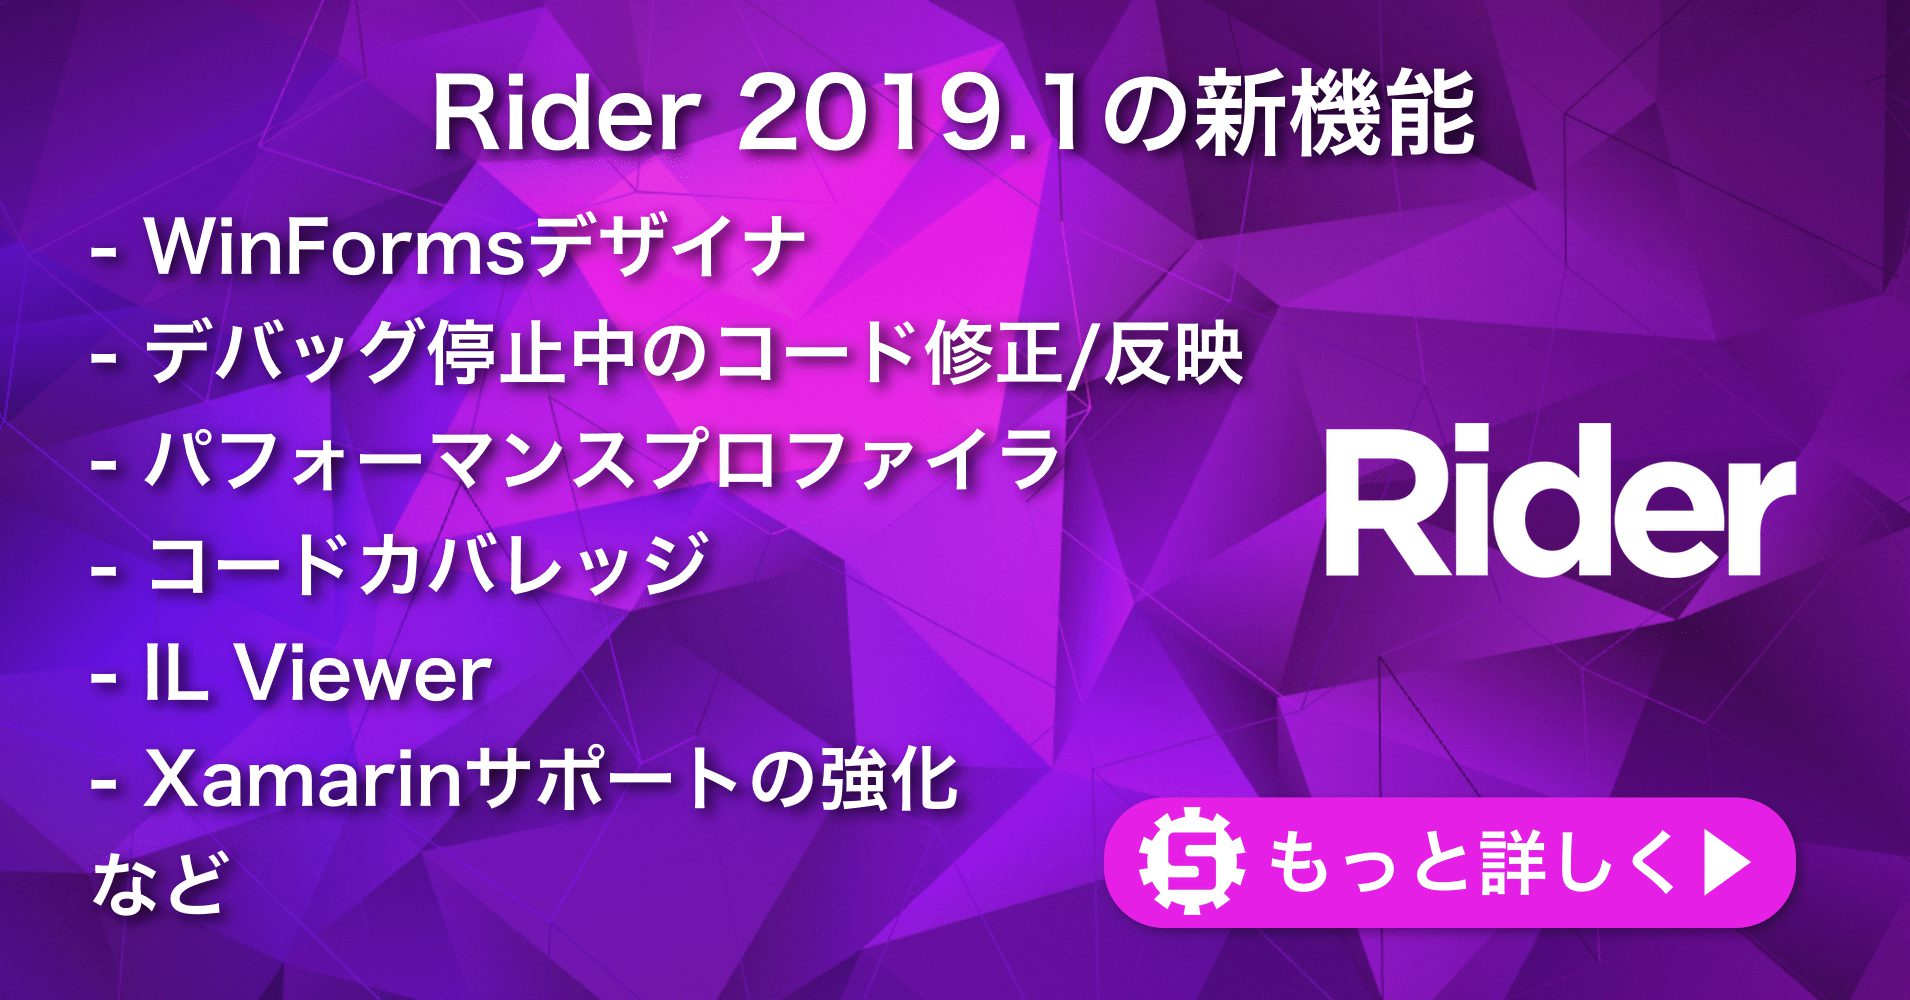 Rider 2019 1の新機能   株式会社サムライズム